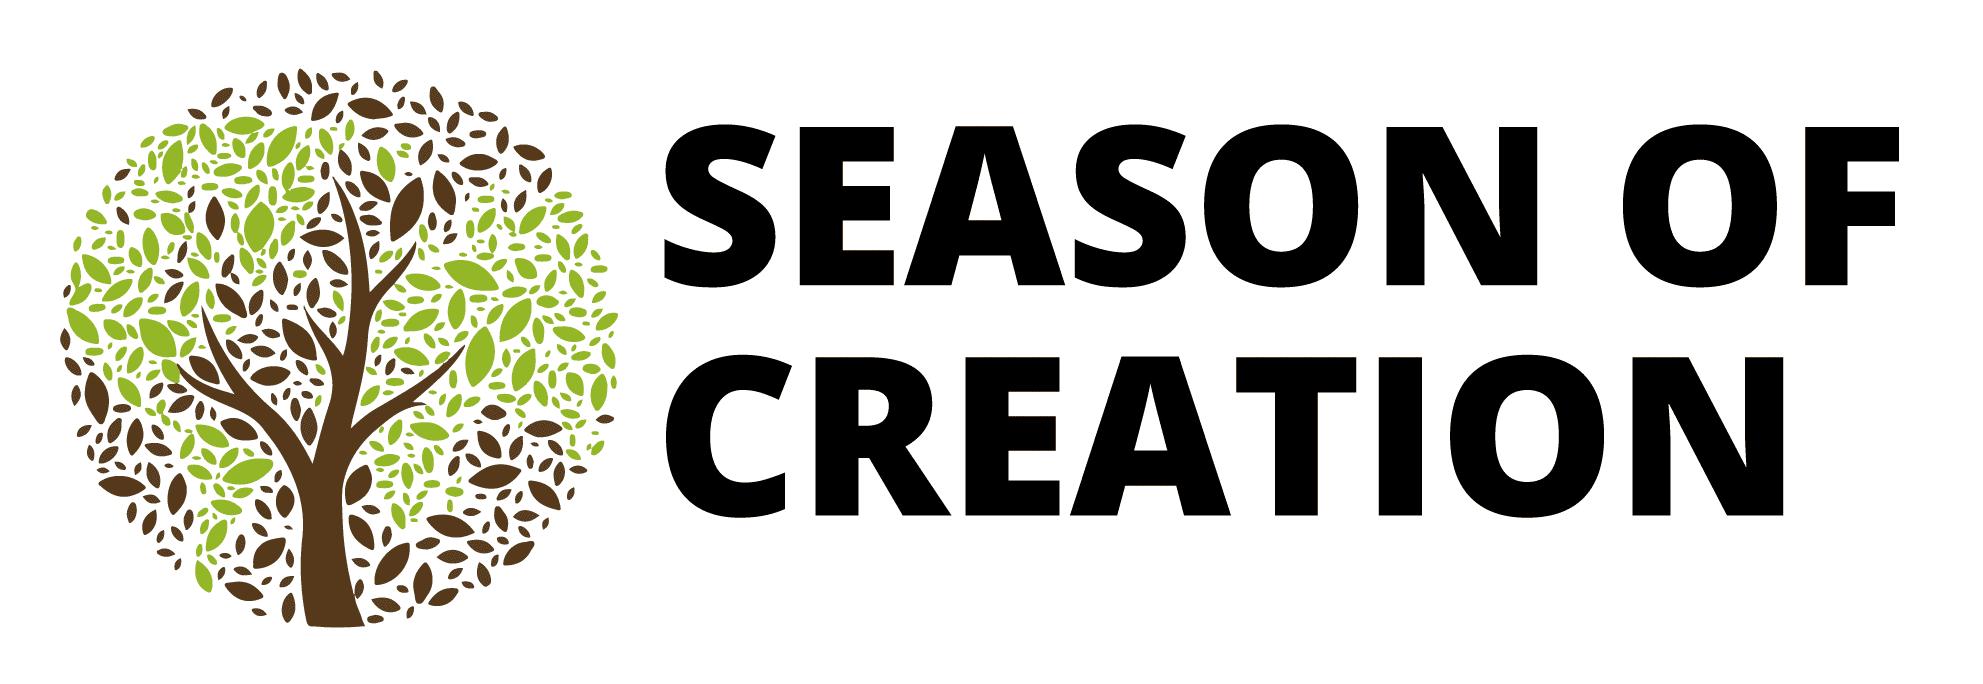 """THE SEASON OF CREATION"": TO RENEW THE OIKOS OF GOD"